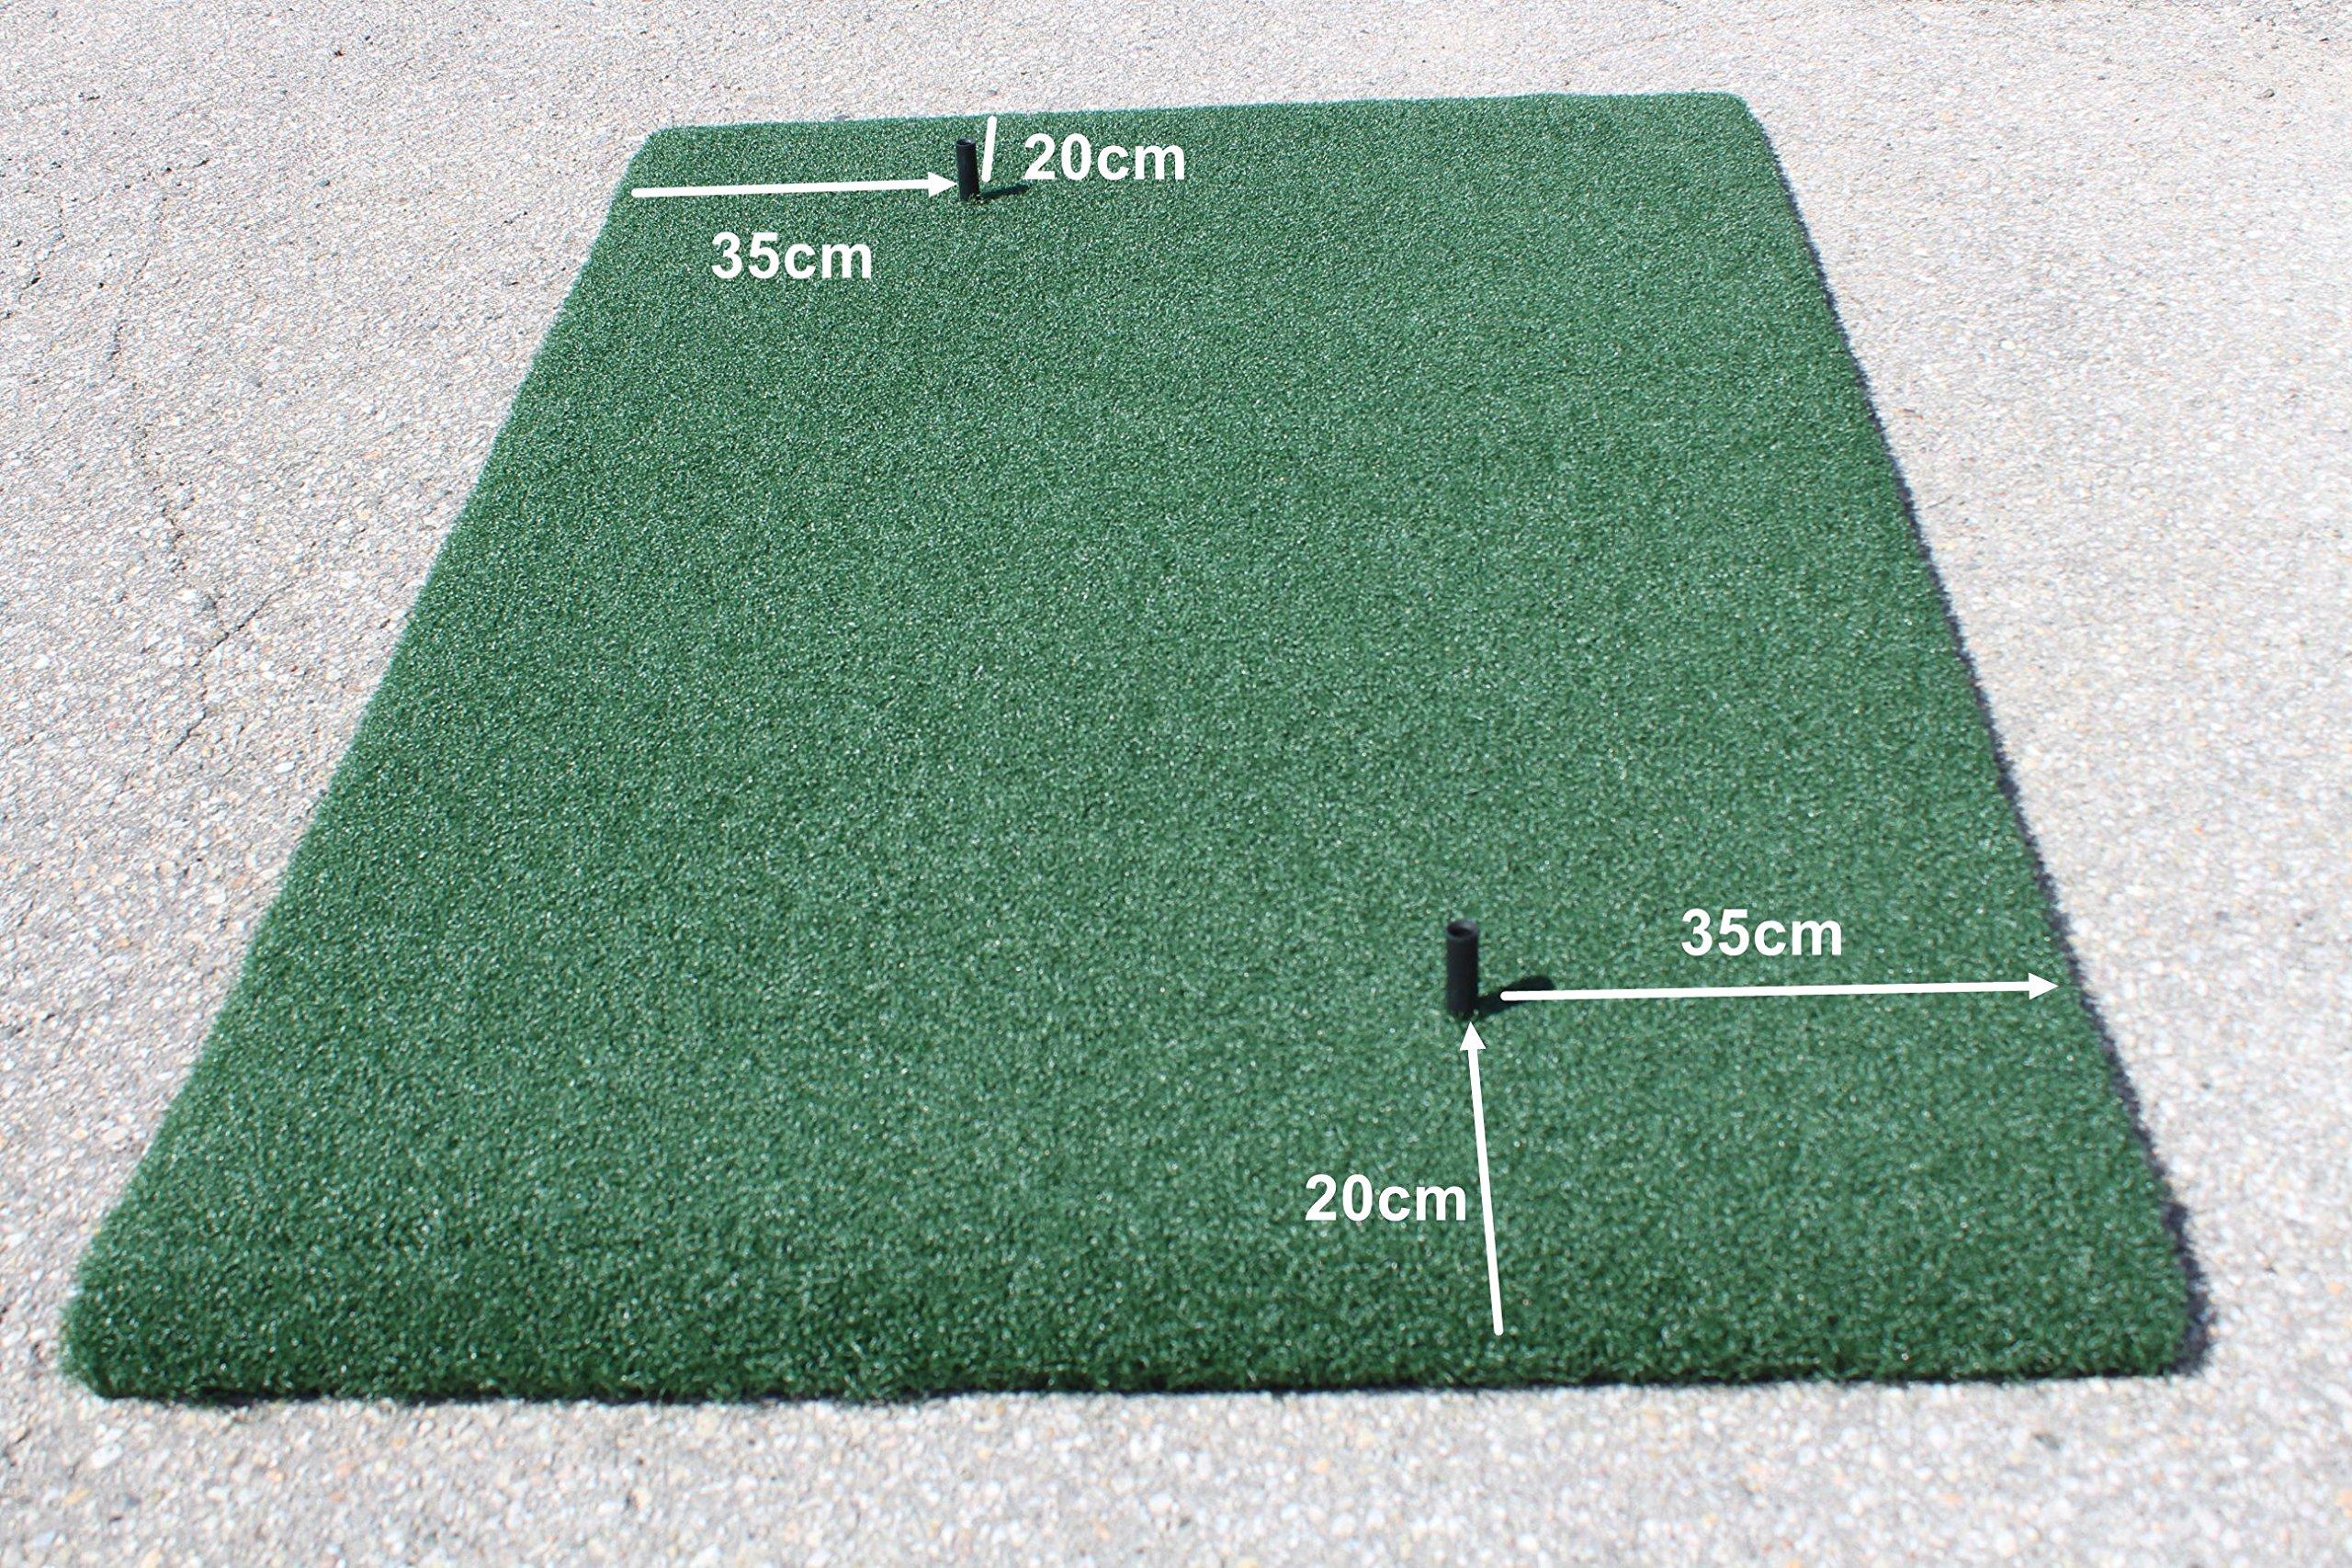 Golf Range True Feel Super Thick mat Golf Chipping Driving Practice Mat 59 x 39 1/2 x1 1/4'' by A99 Golf (Image #5)